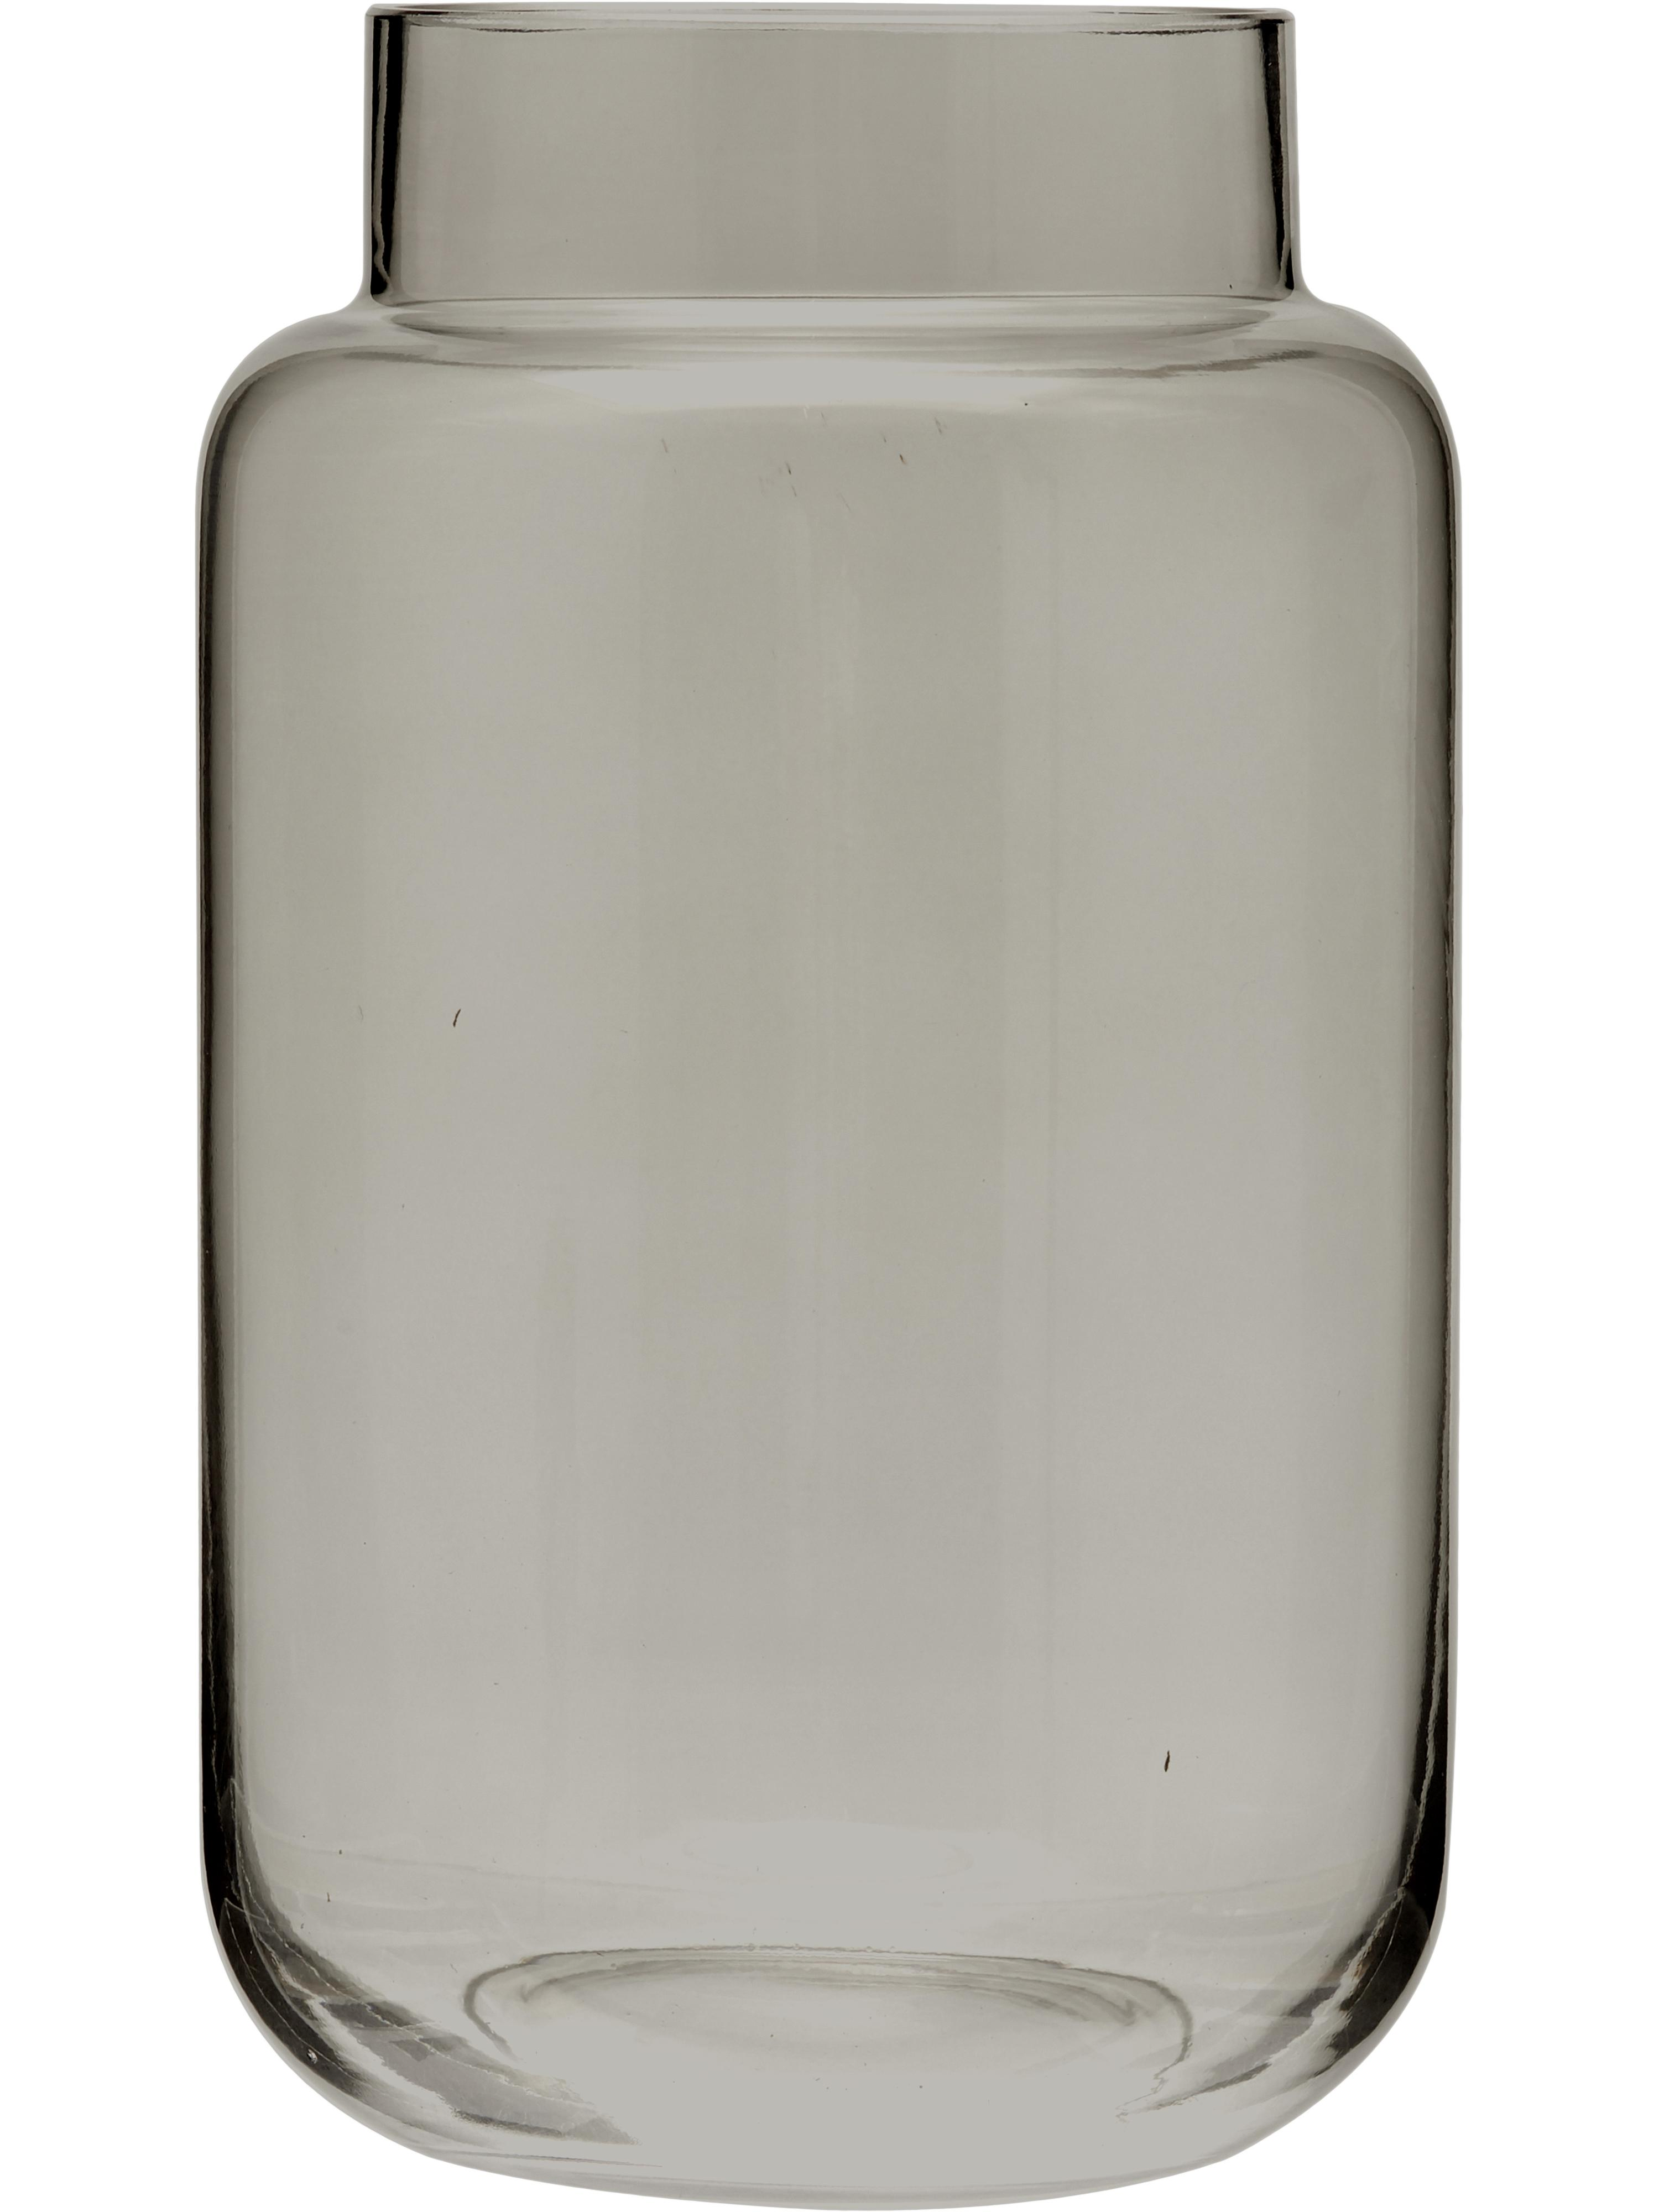 Glas-Vase Lasse, groß, Glas, Grau, transparent, Ø 13 x H 22 cm